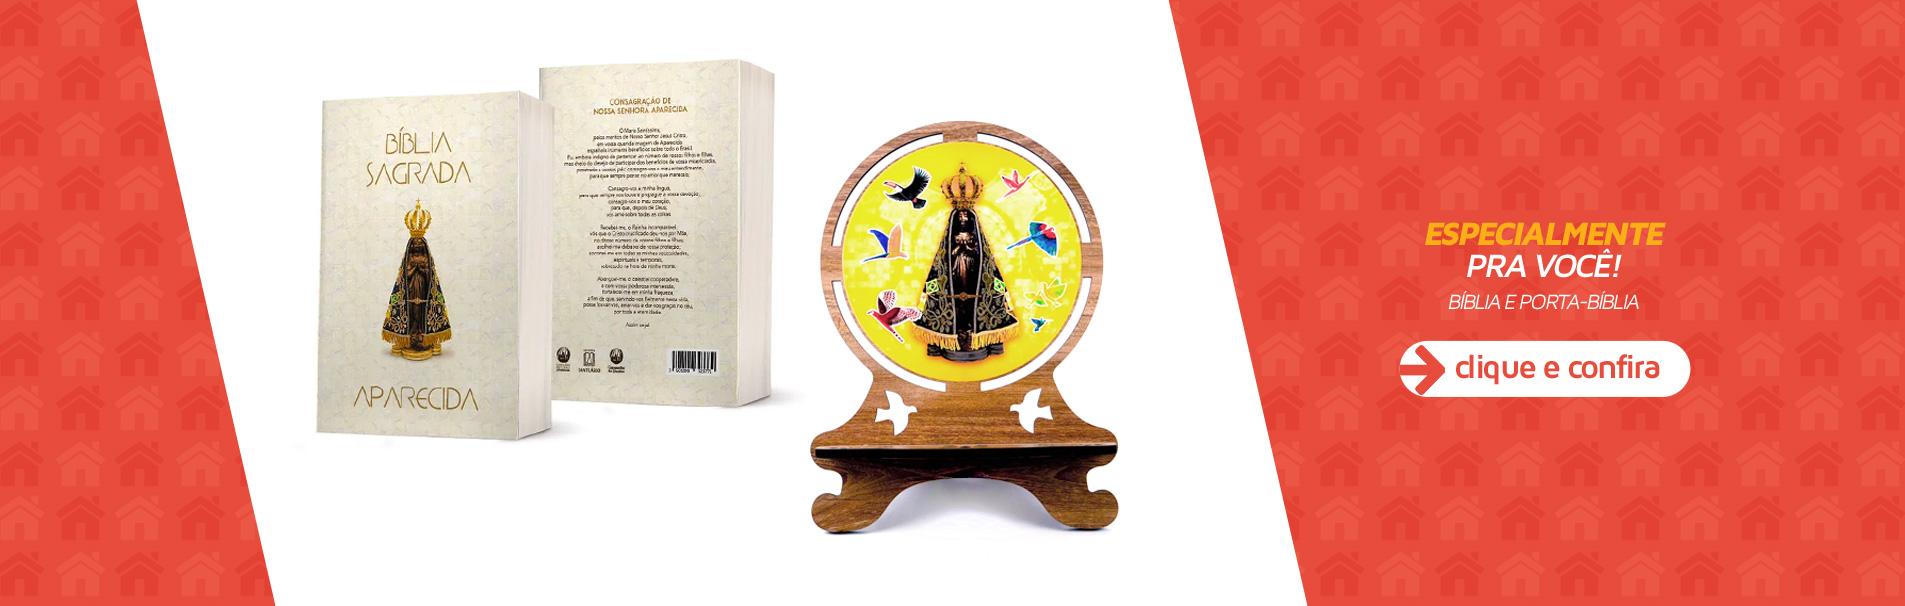 Bíblia e Porta-Bíblia